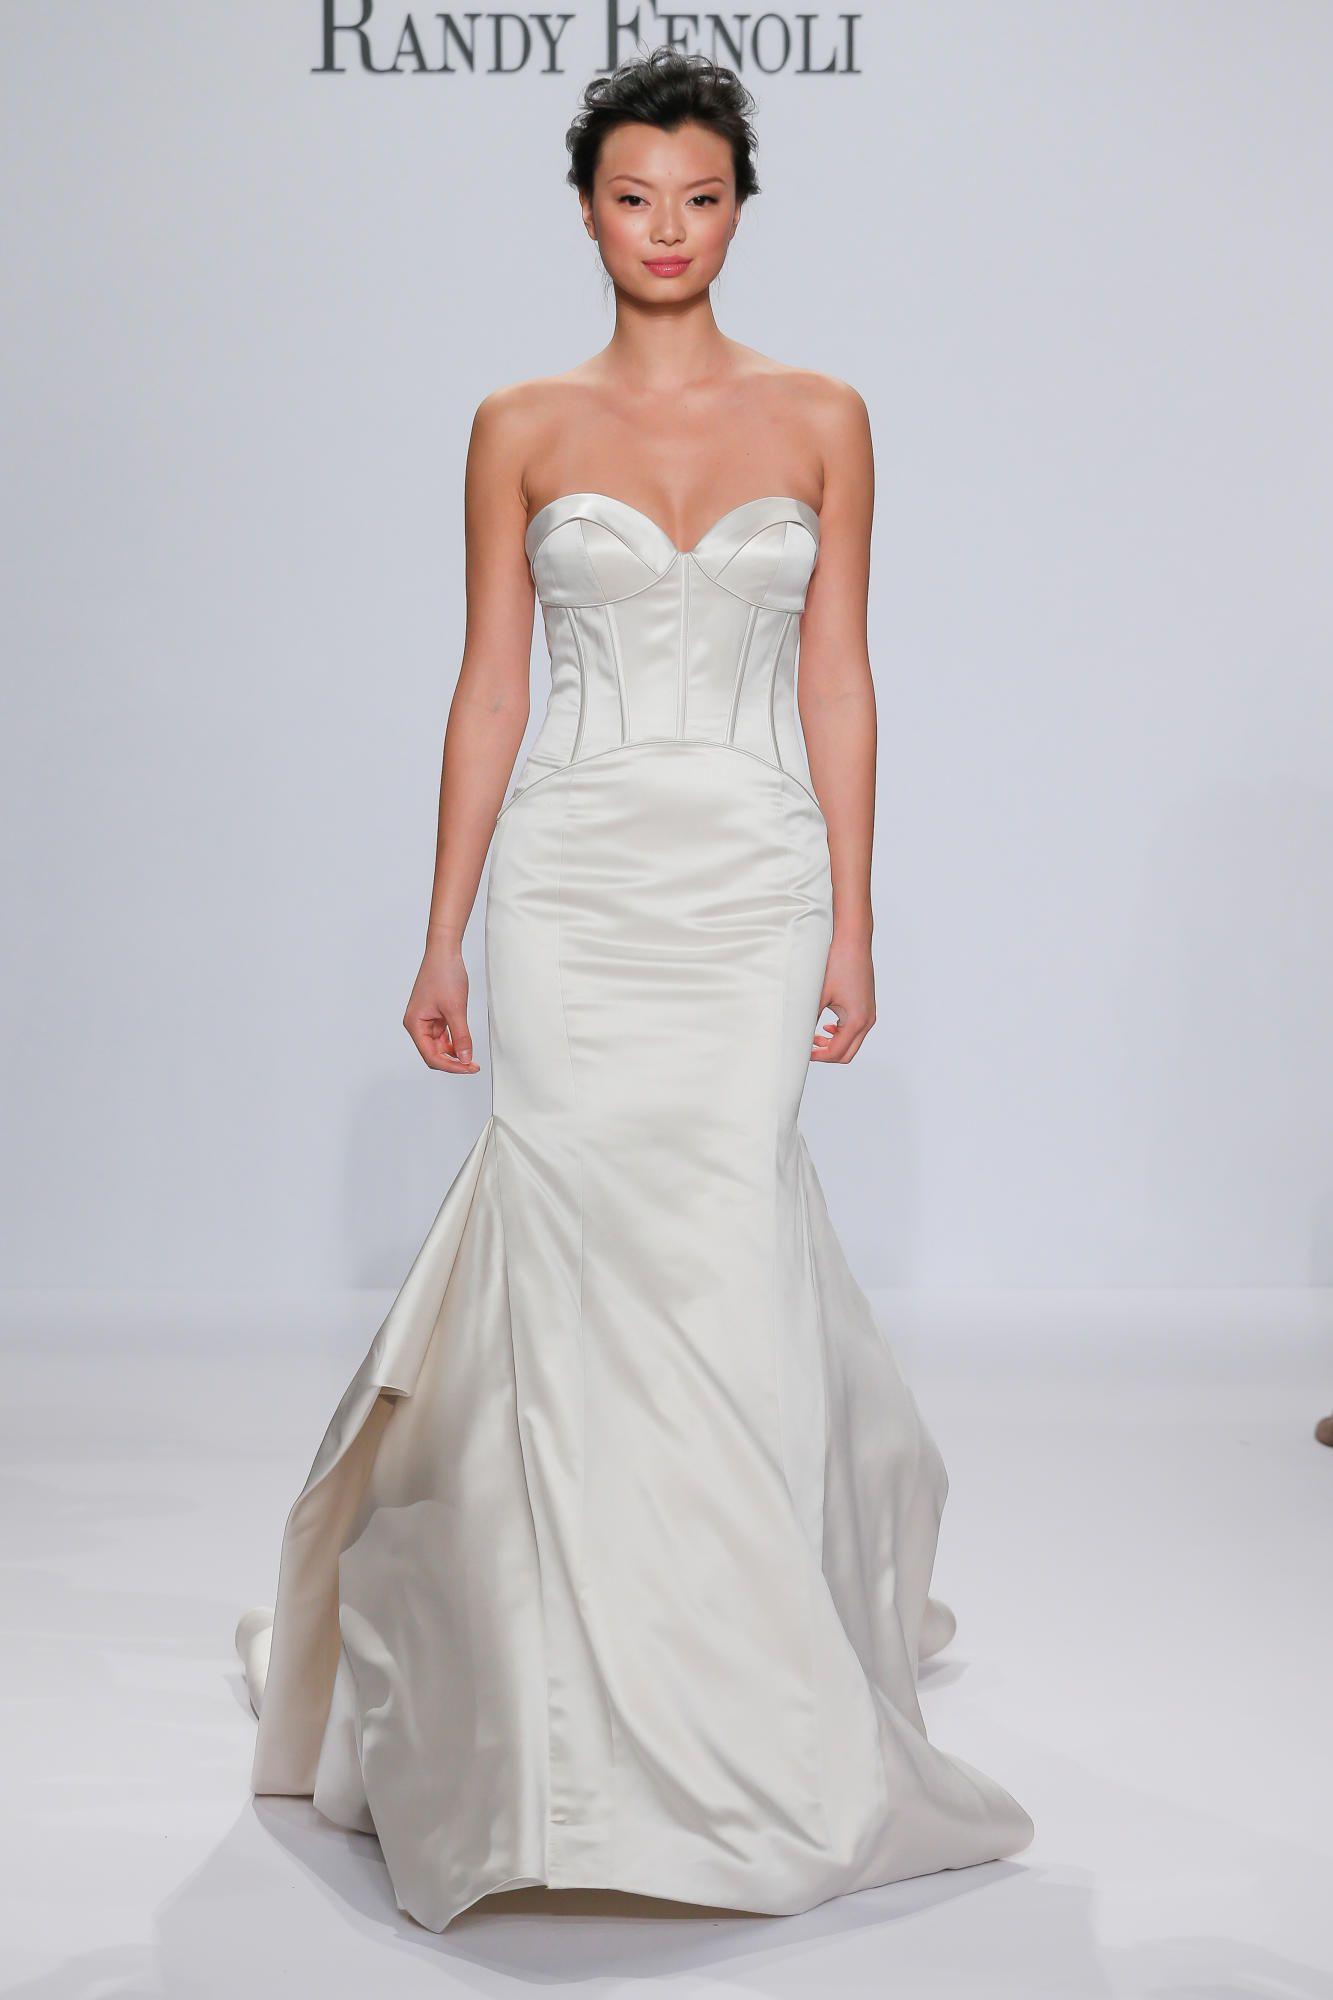 randy-fenoli-spring-2018-bridal-corset-gown Tendências de vestidos de noiva para 2018